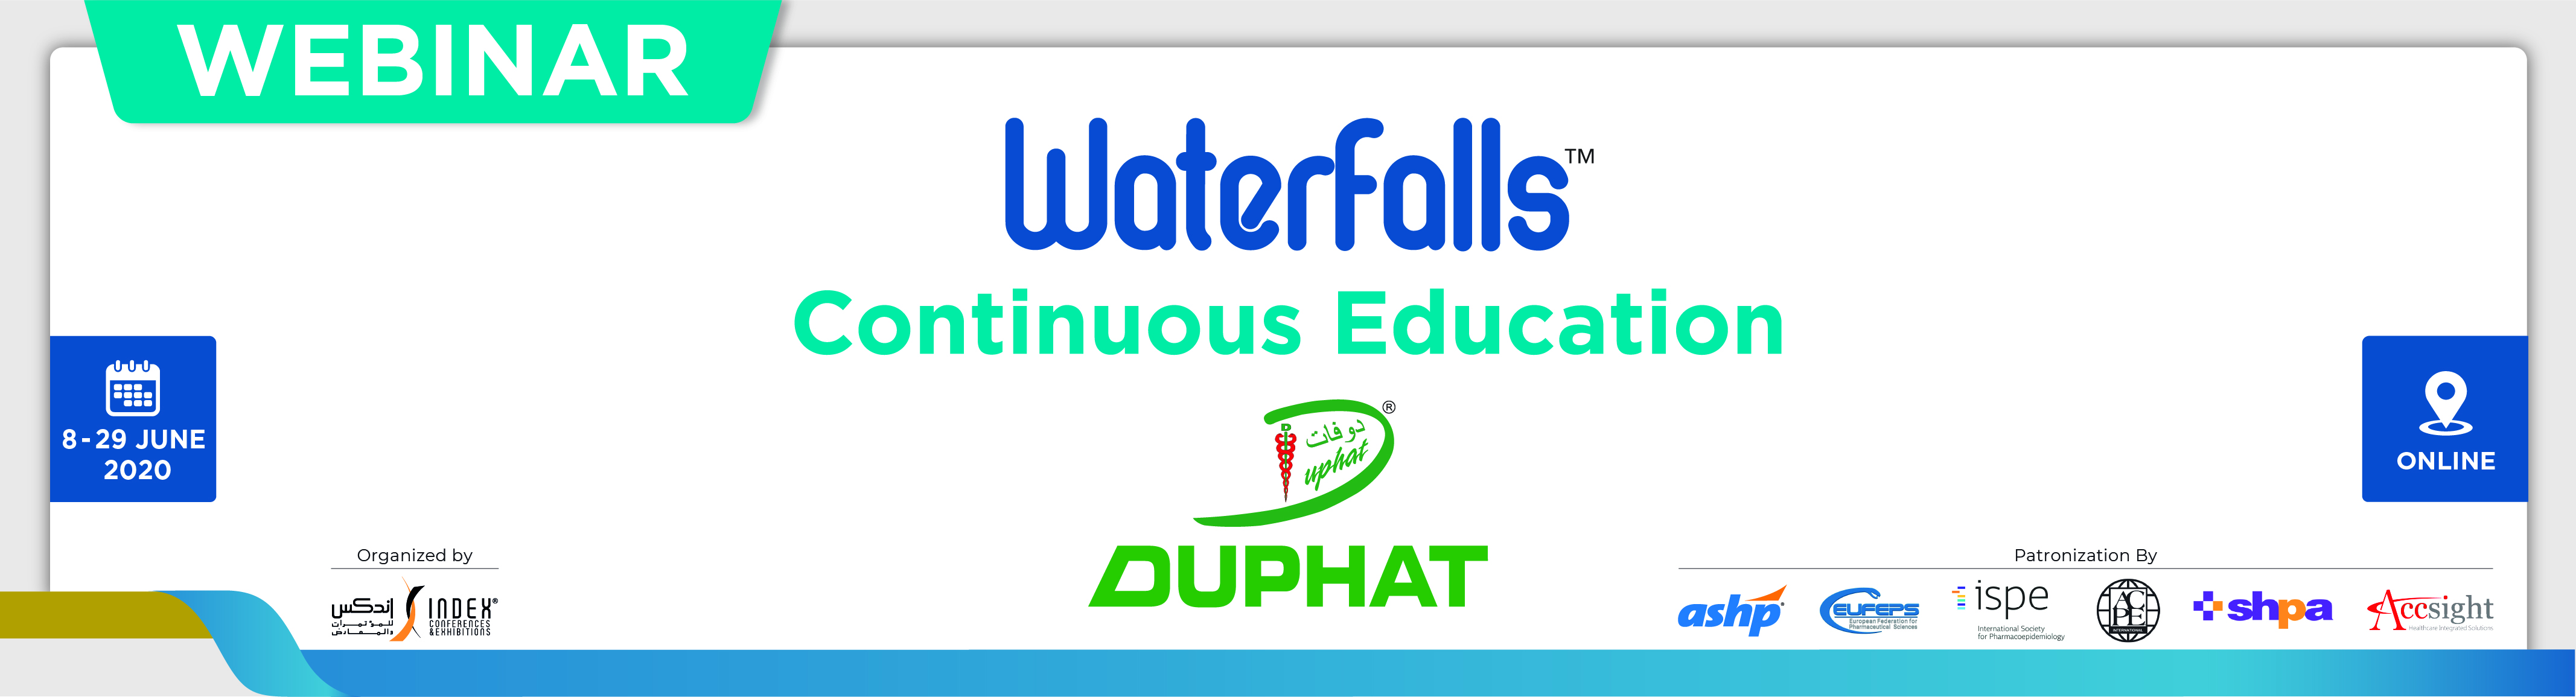 "DUPHAT Waterfalls Webinar ""COVID-19 Outbreak"", June 18 (17:00 - 18:00)"